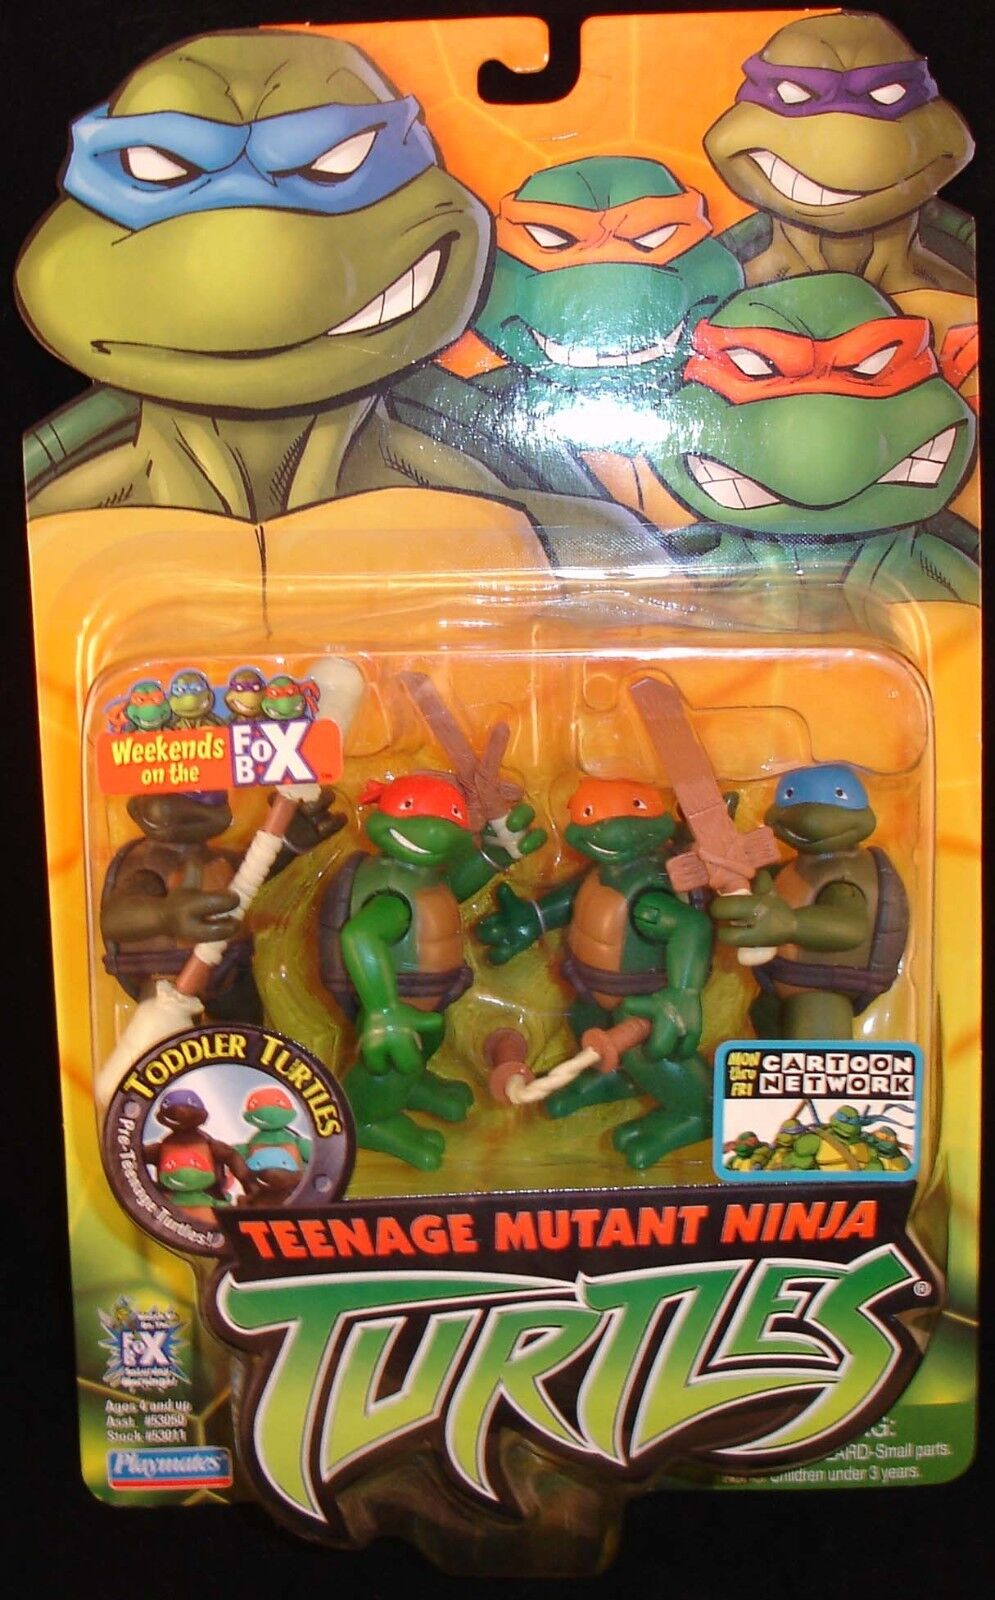 Teenage Mutant Ninja Toddler Turtles Tots TMNT '04 MOC MOC MOC 4 Kids Action Figures 2K3 624974